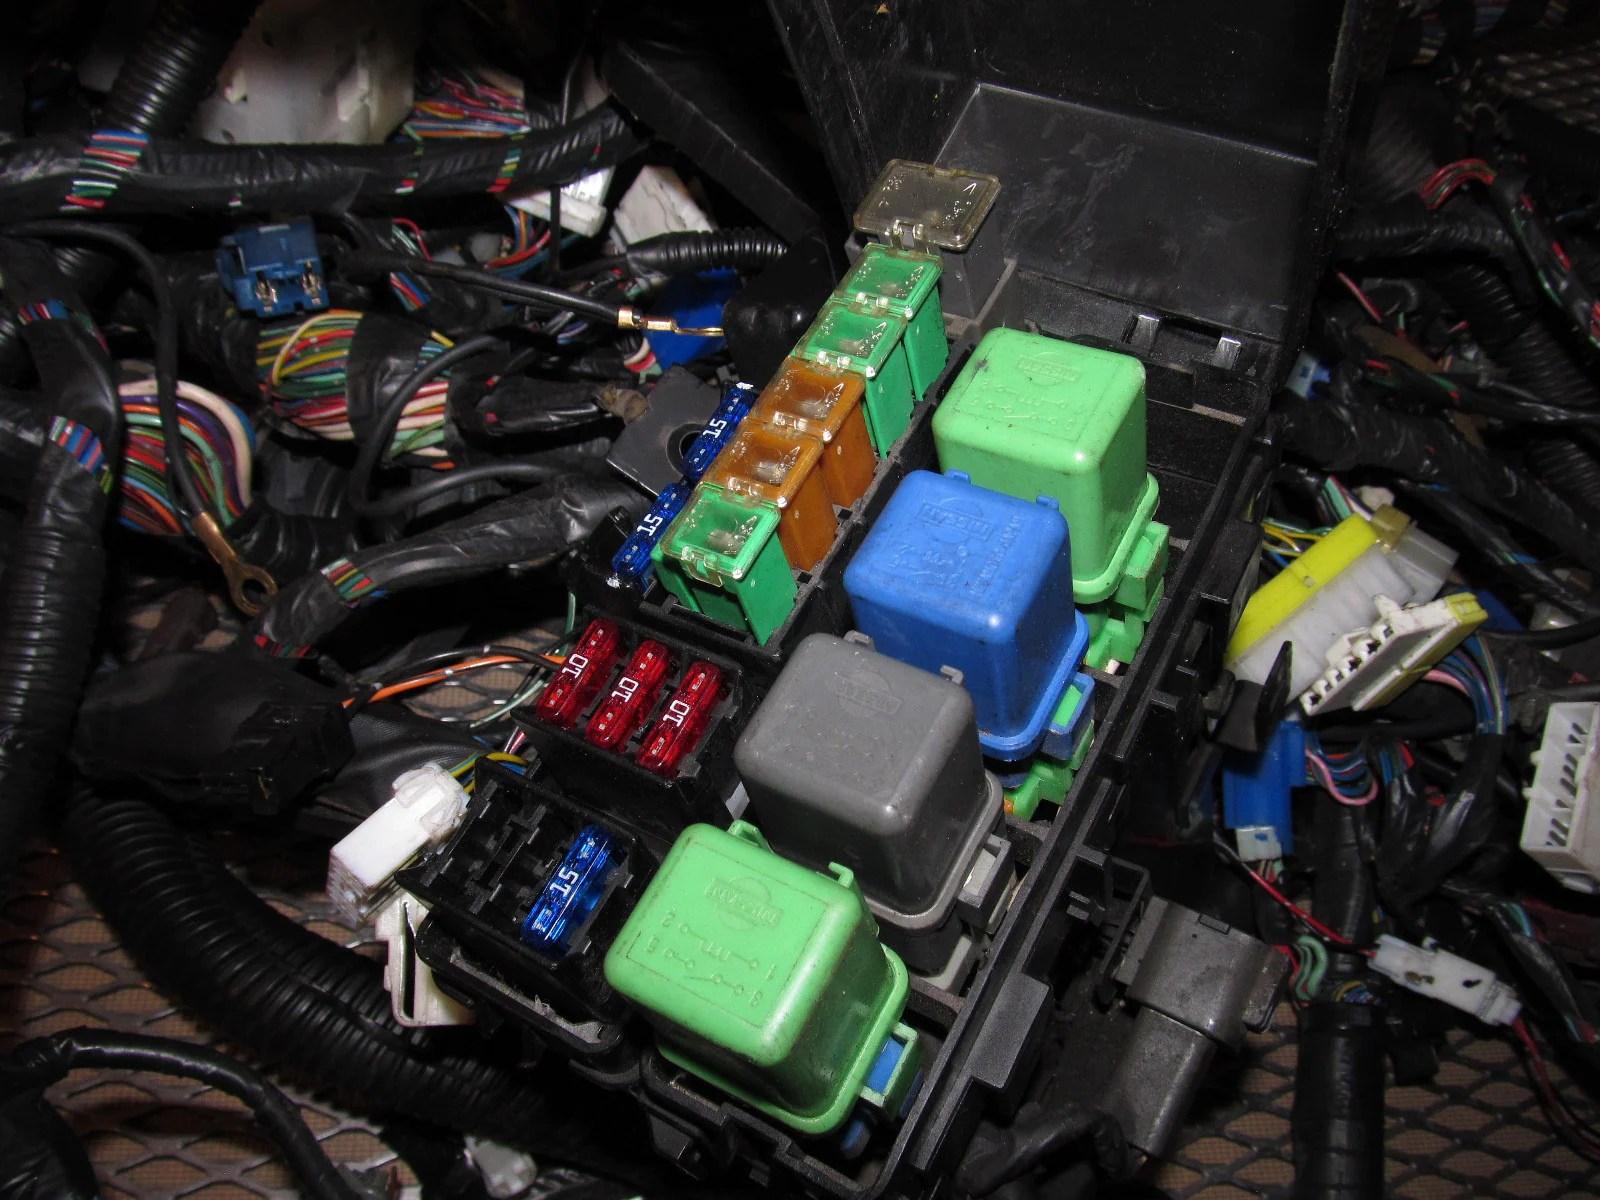 medium resolution of 91 92 93 94 nissan 240sx oem fuse box wiring harness autopartone com f150 fuse box